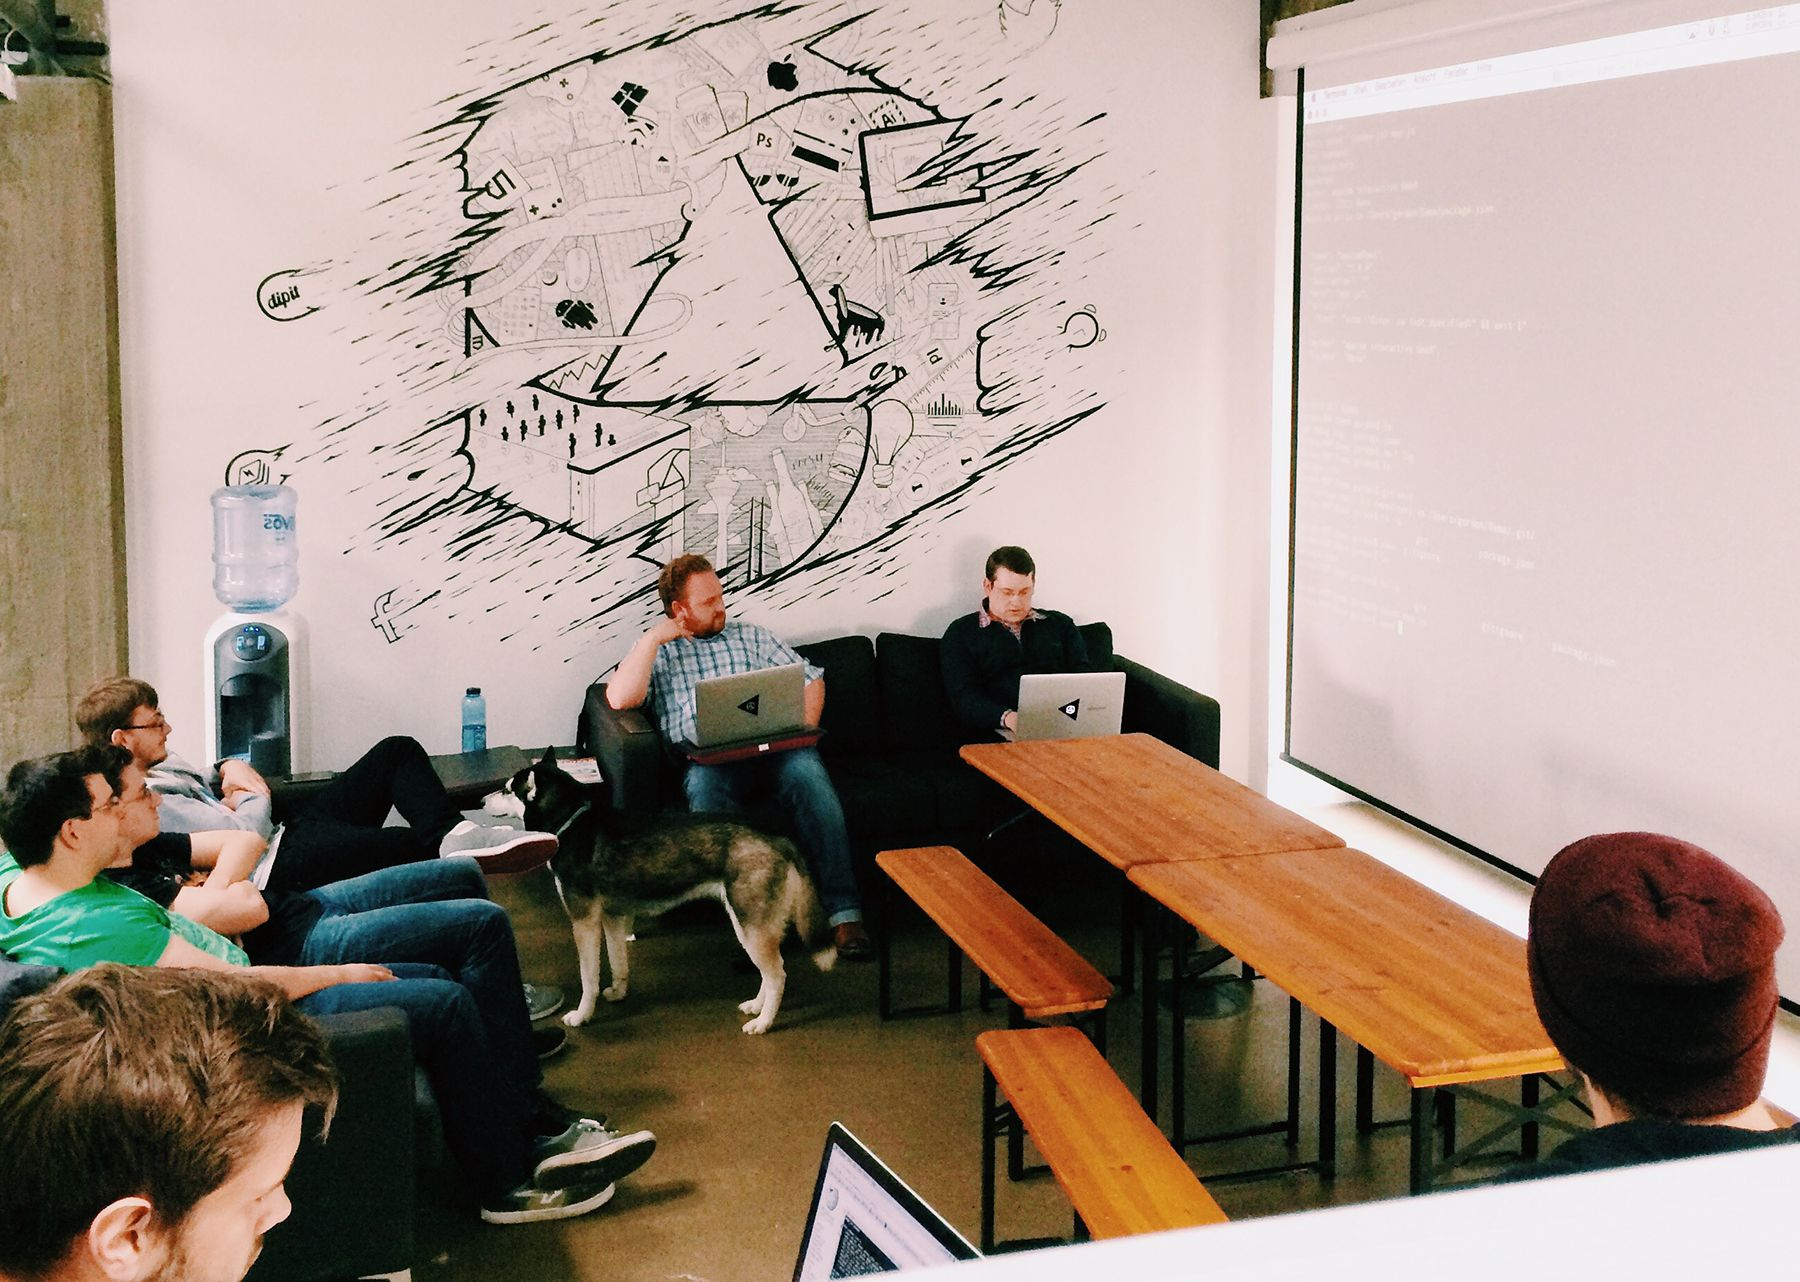 developers meeting | code | software | program | appcom office